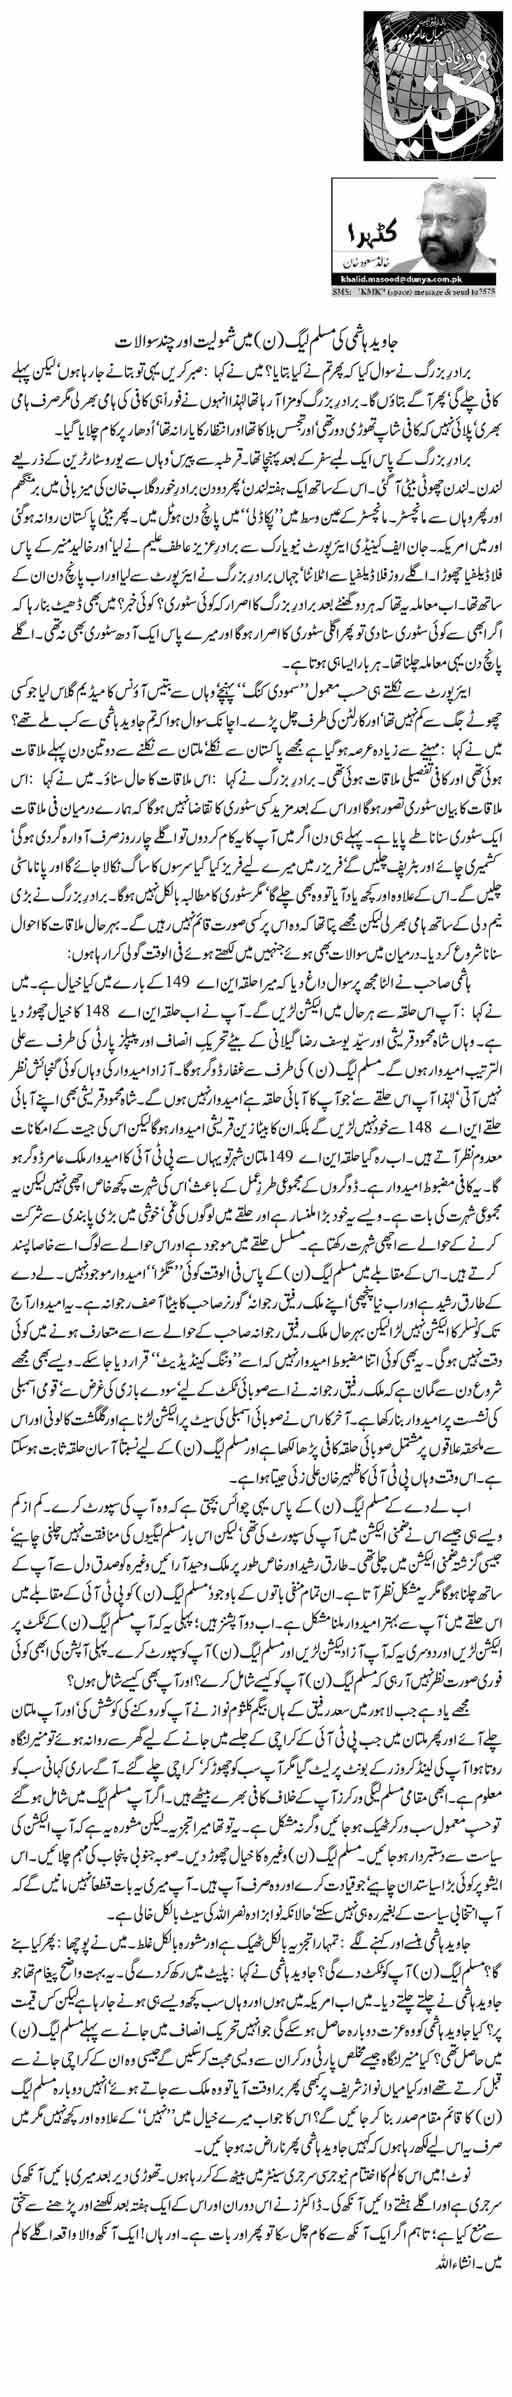 Javed Hashmi Ki Muslim League (N) Mein Shamuliat Aur Chand Sawalaat | Khalid Masood Khan | Daily Urdu Columns